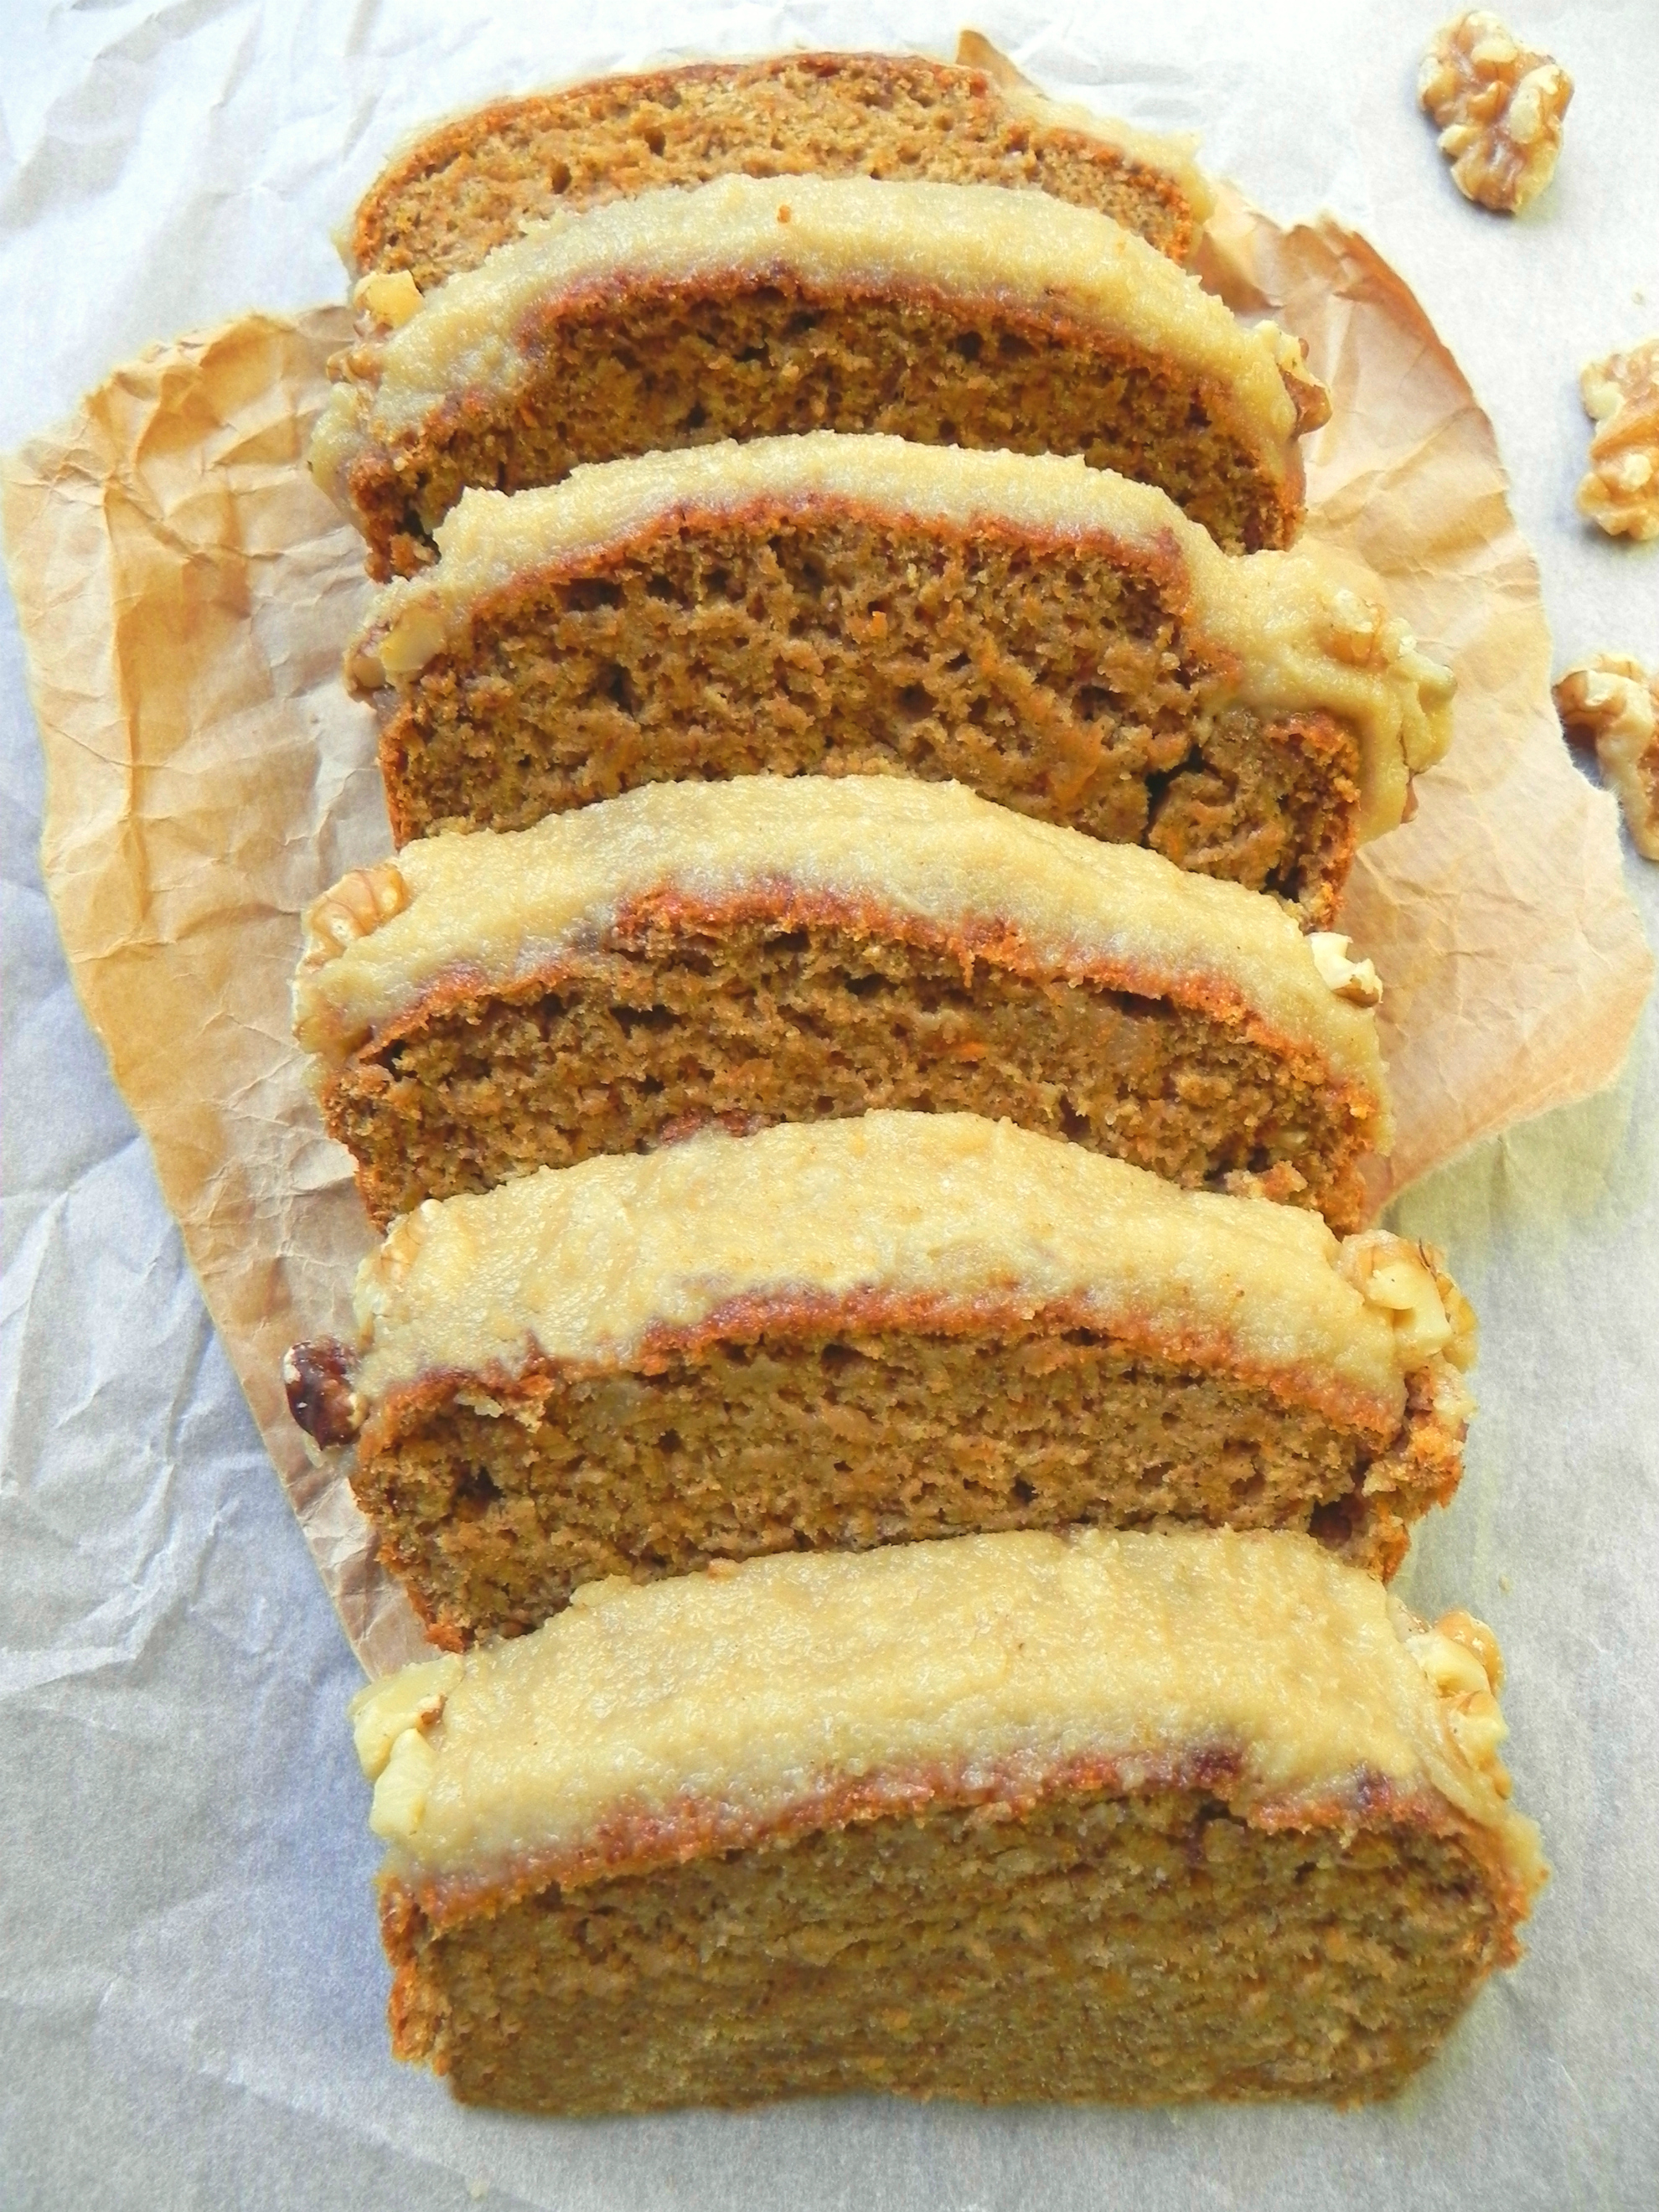 Vegan carrot cake recipes from scratch